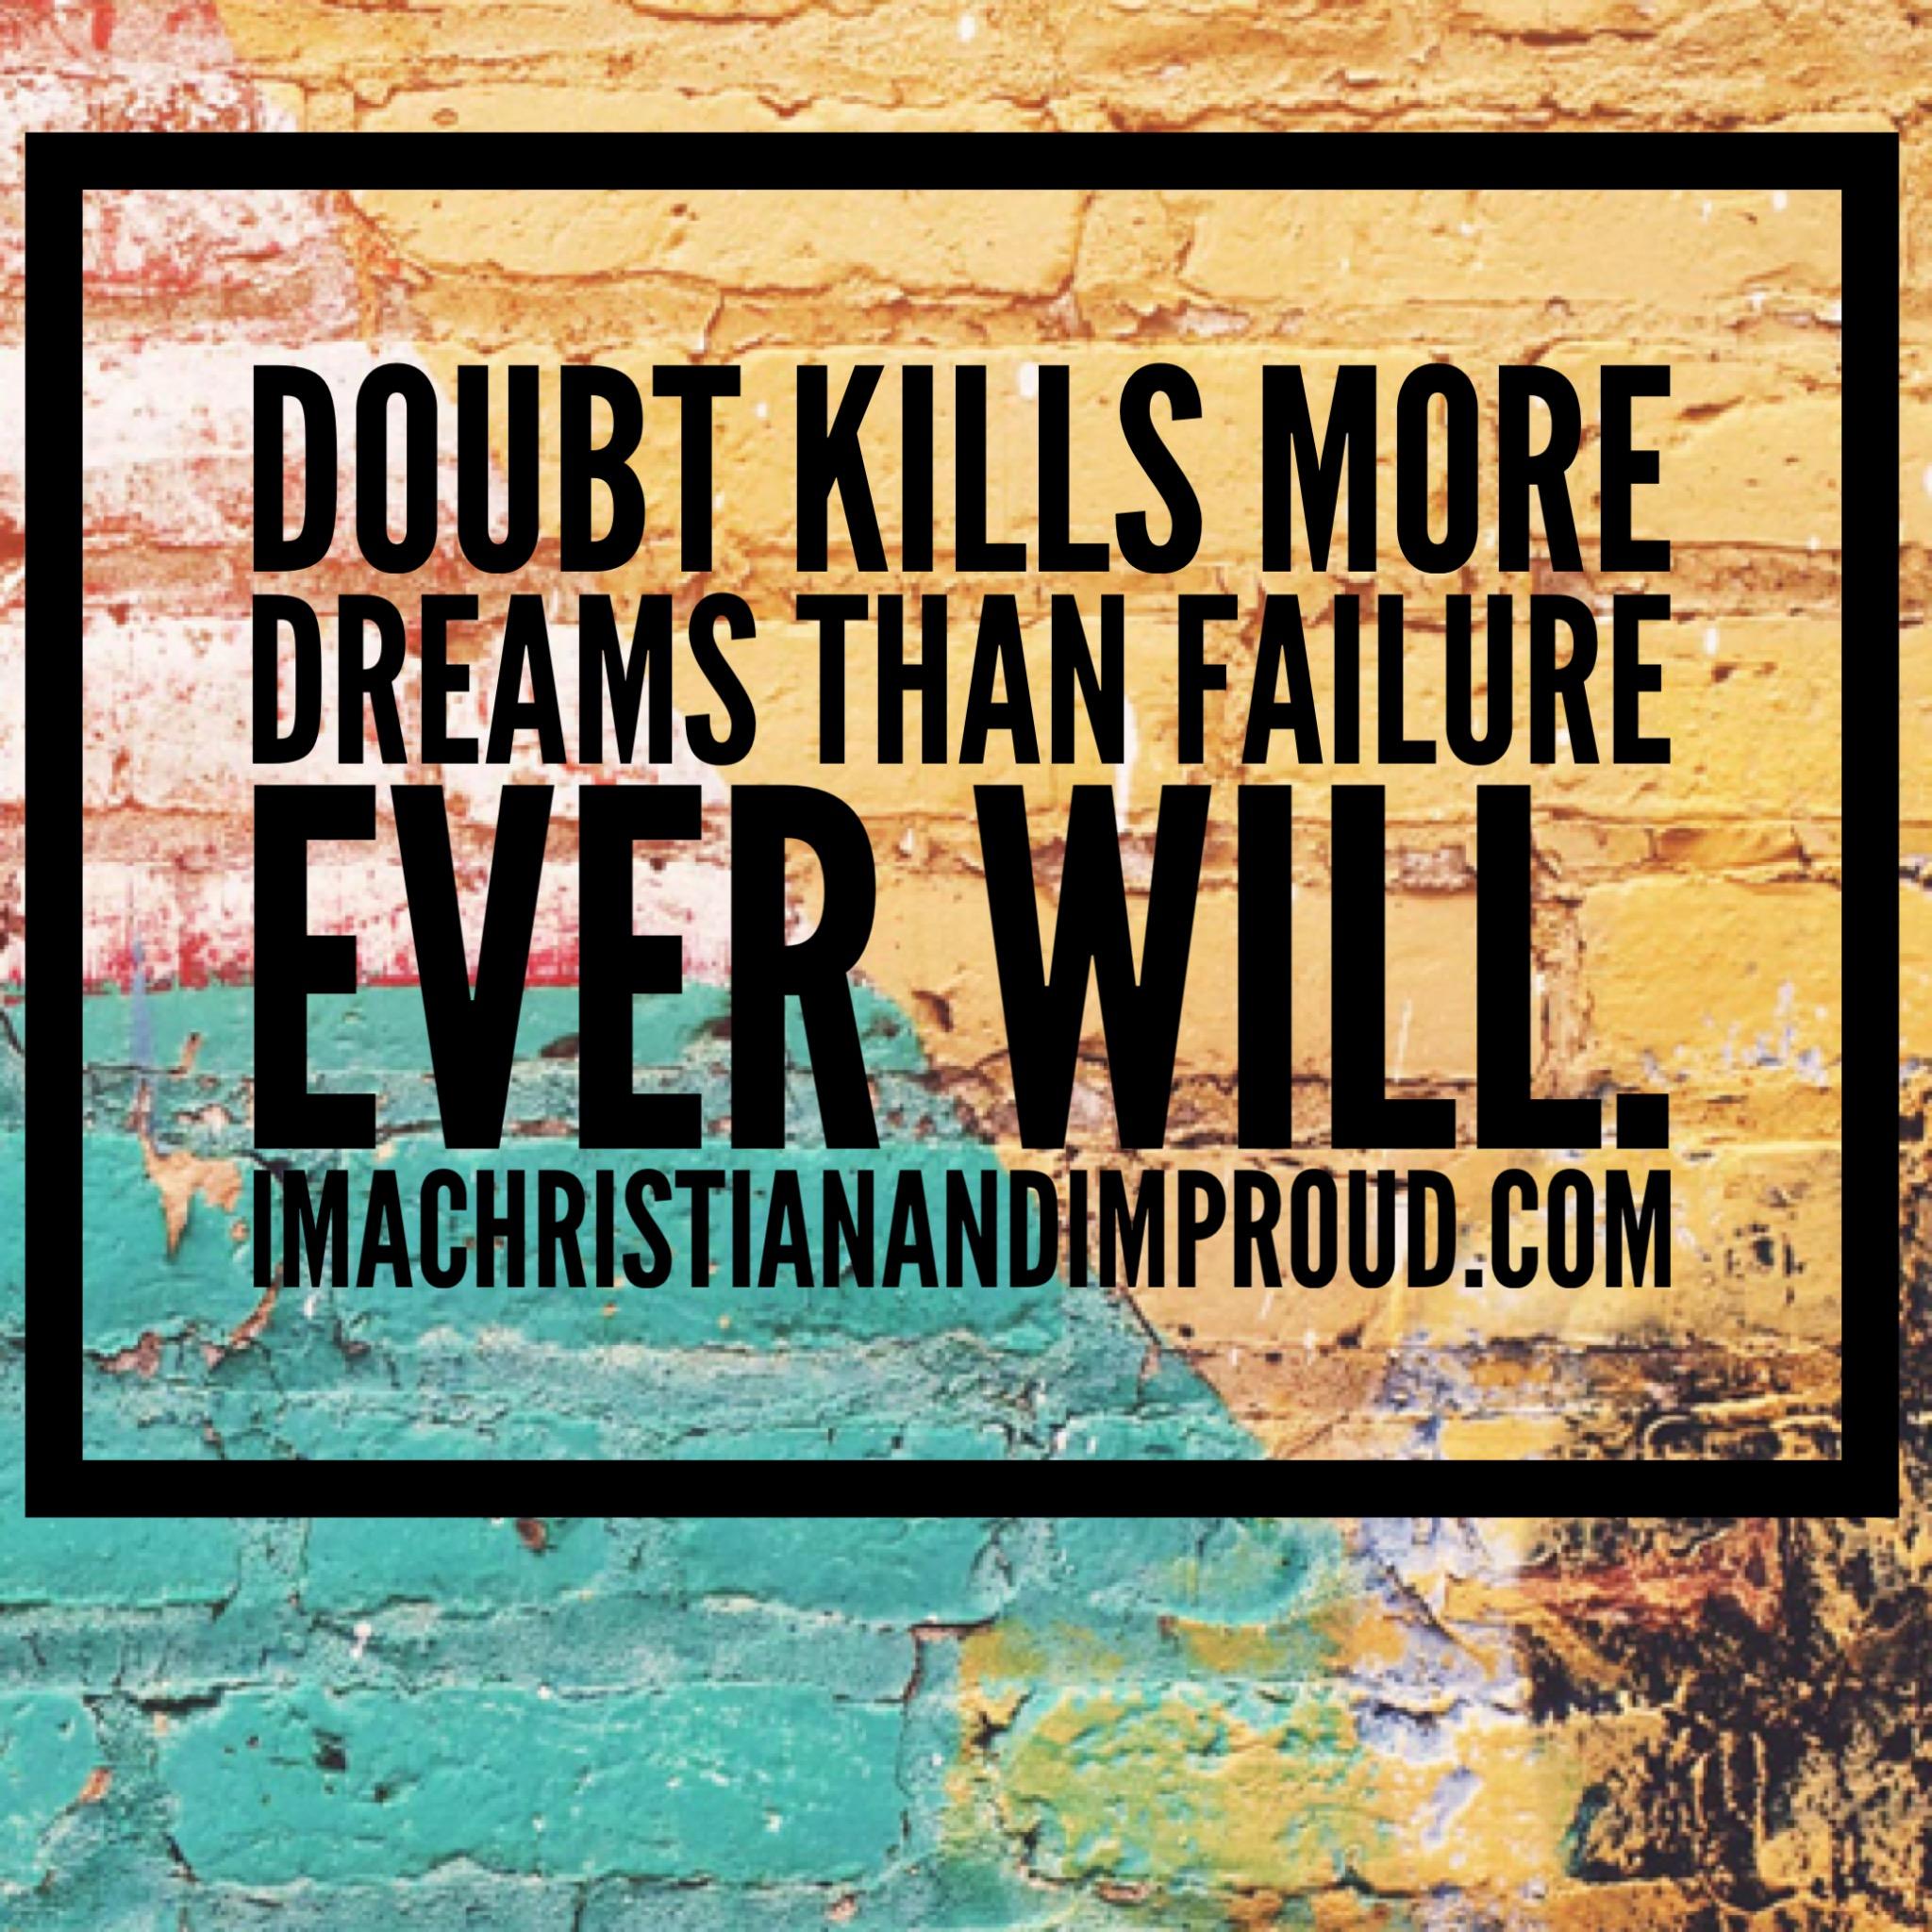 Inspirational Quotes Motivation: DON'T LET DOUBT KILL YOUR DREAMS